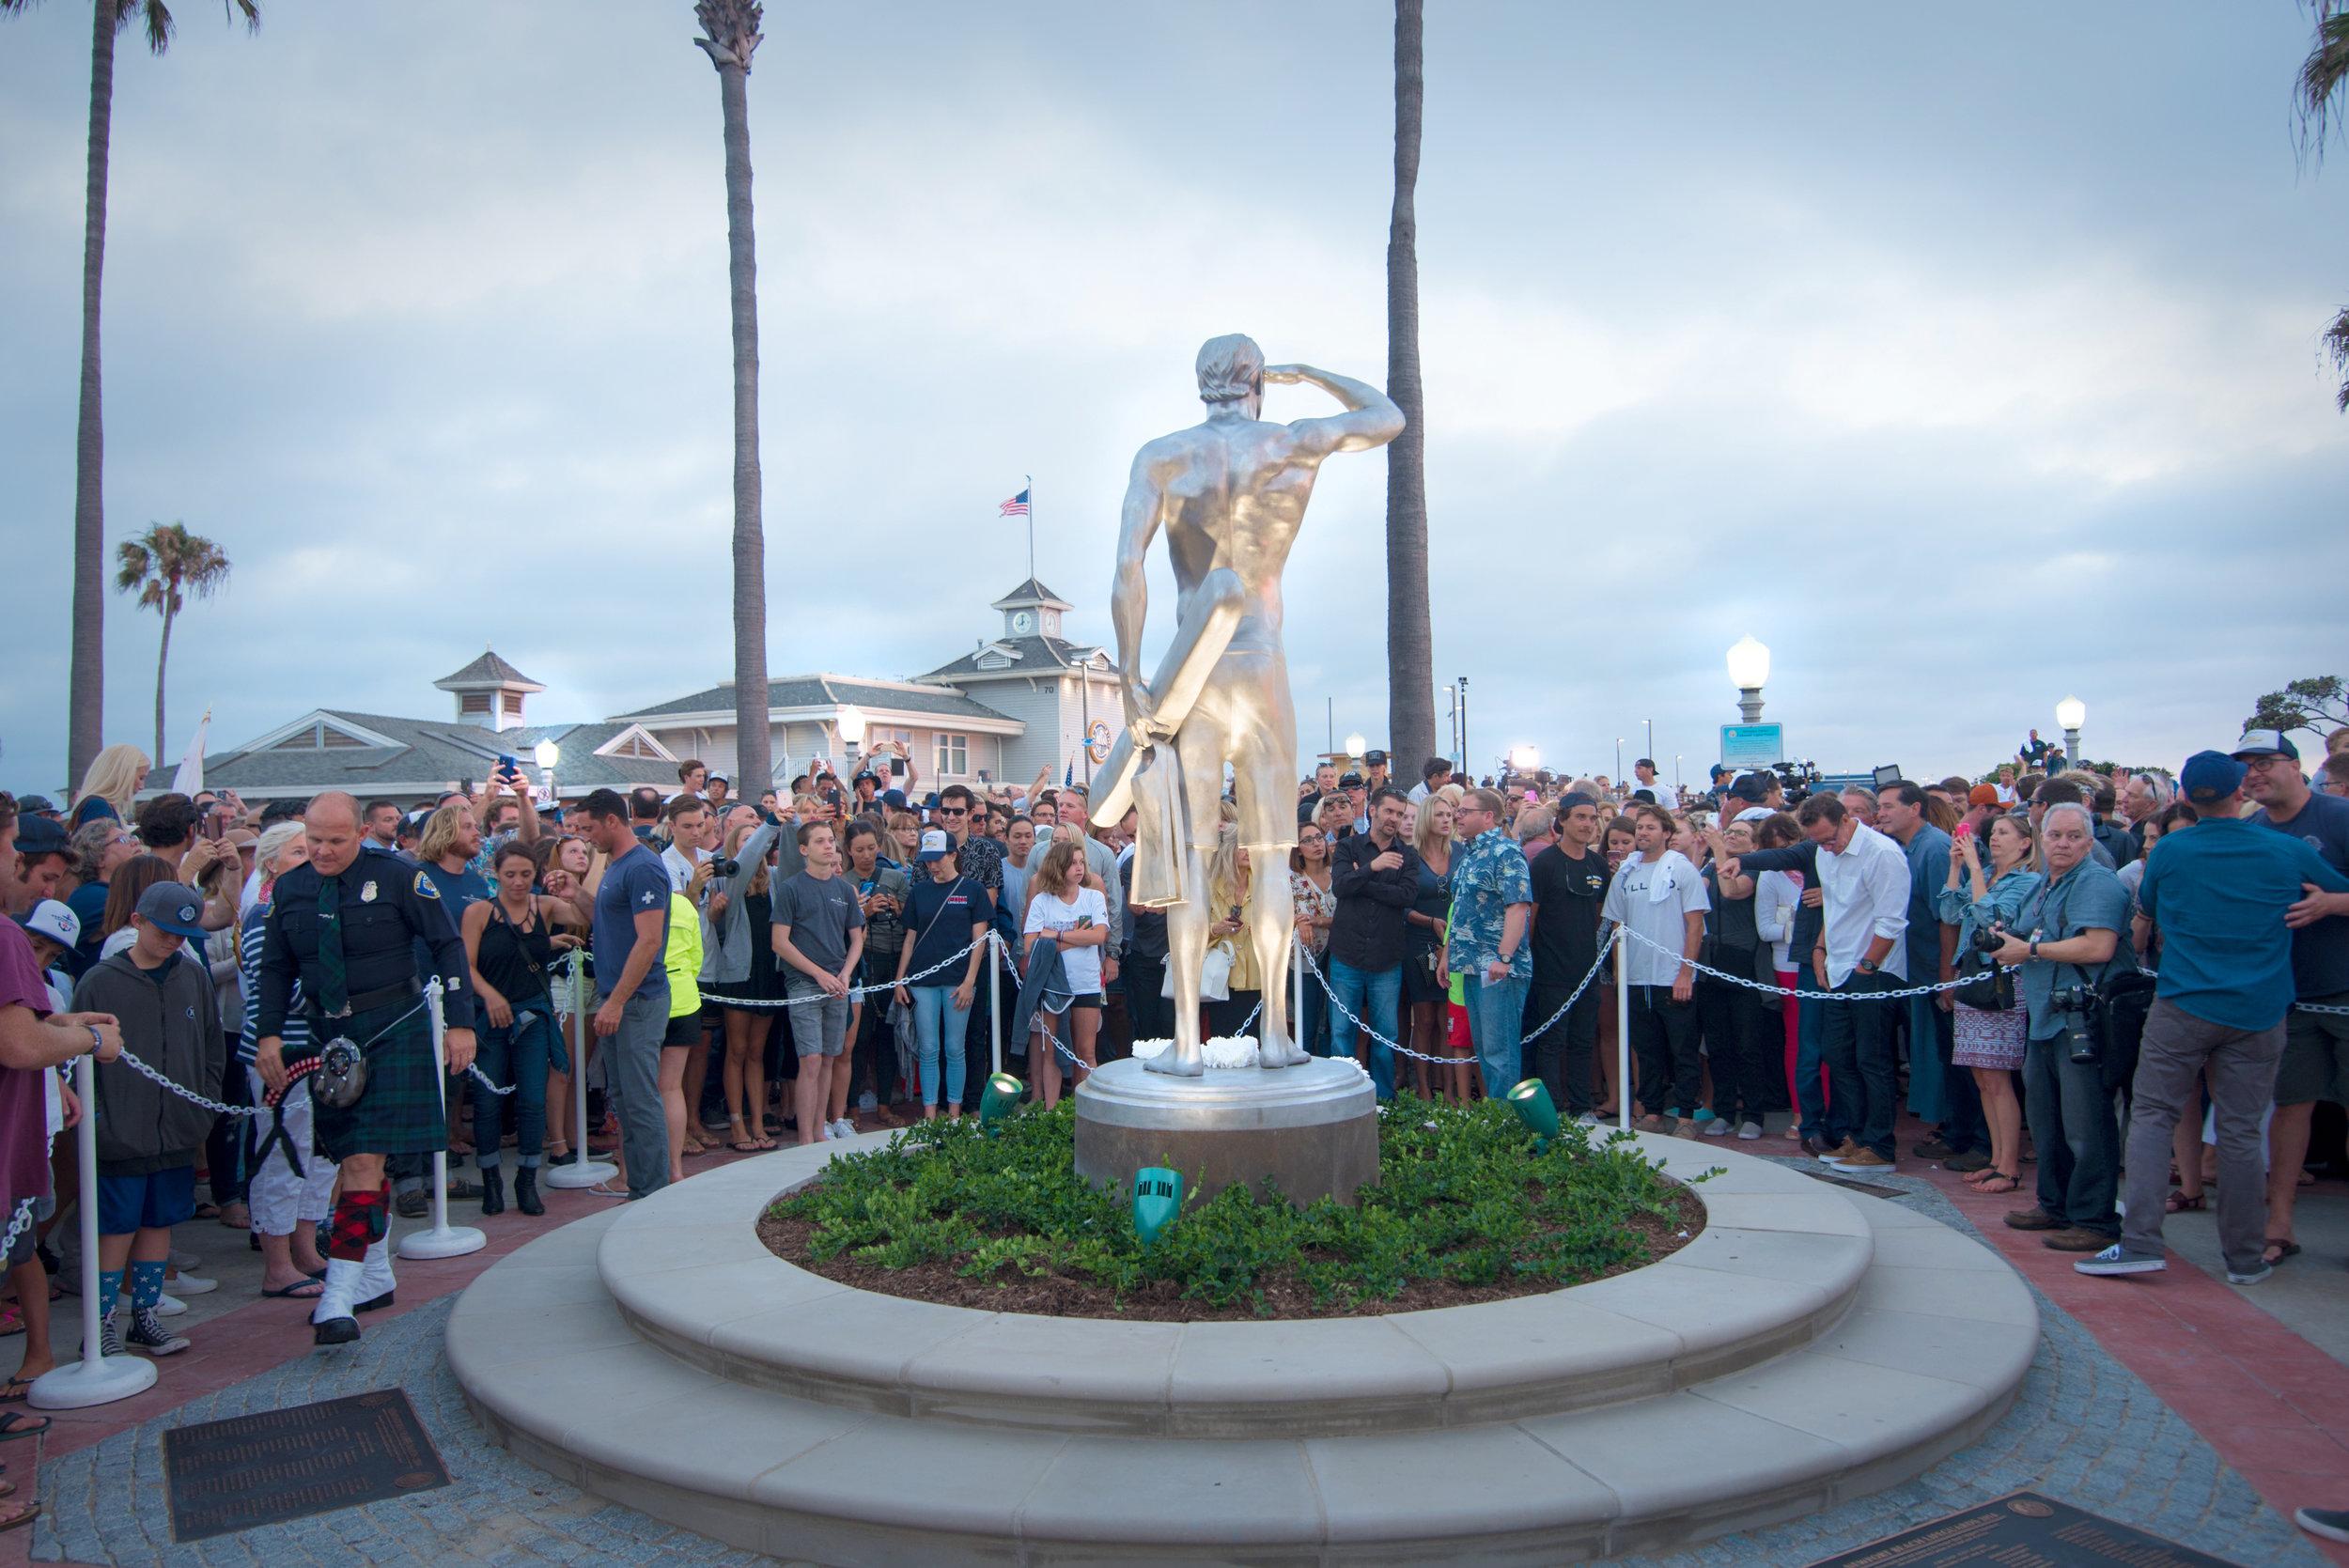 Steel Sculpture for Ben Carlson Memorial, Newport Beach, Ca. 2016. // Sculptor: Jake Janz Fine Art // Landscape Architect:  Lifescapes International // Contractor:  BrightView